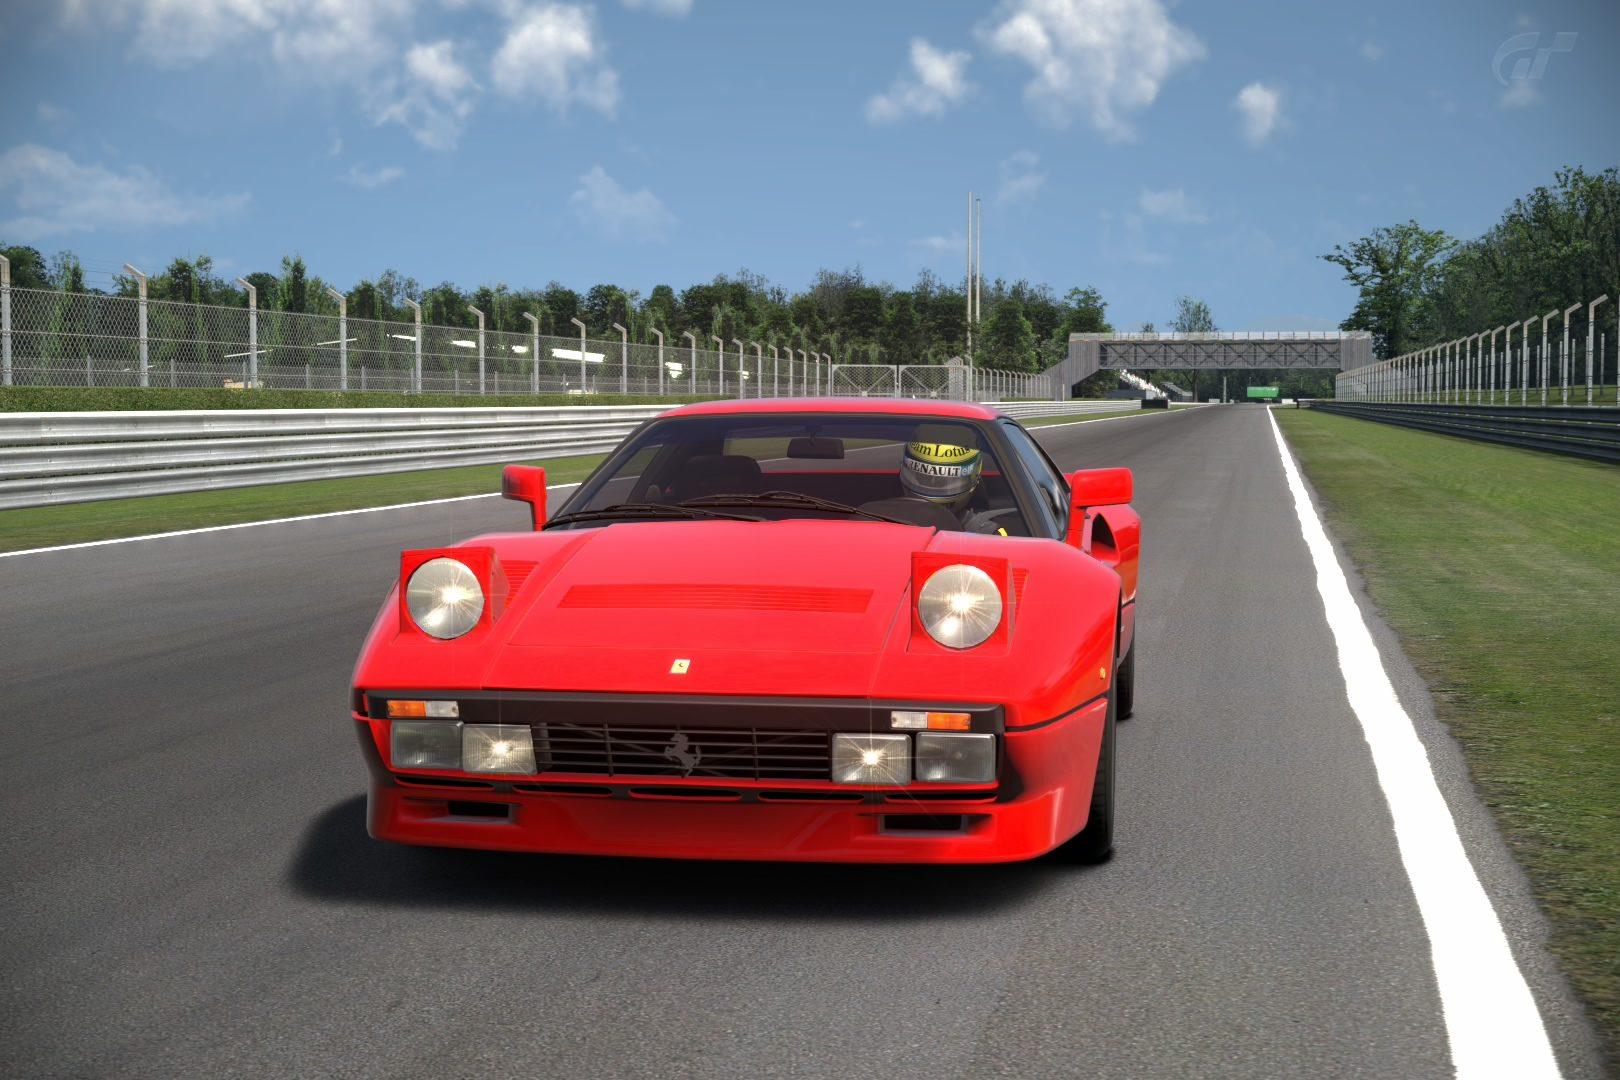 FerrariGTOImg1.jpg